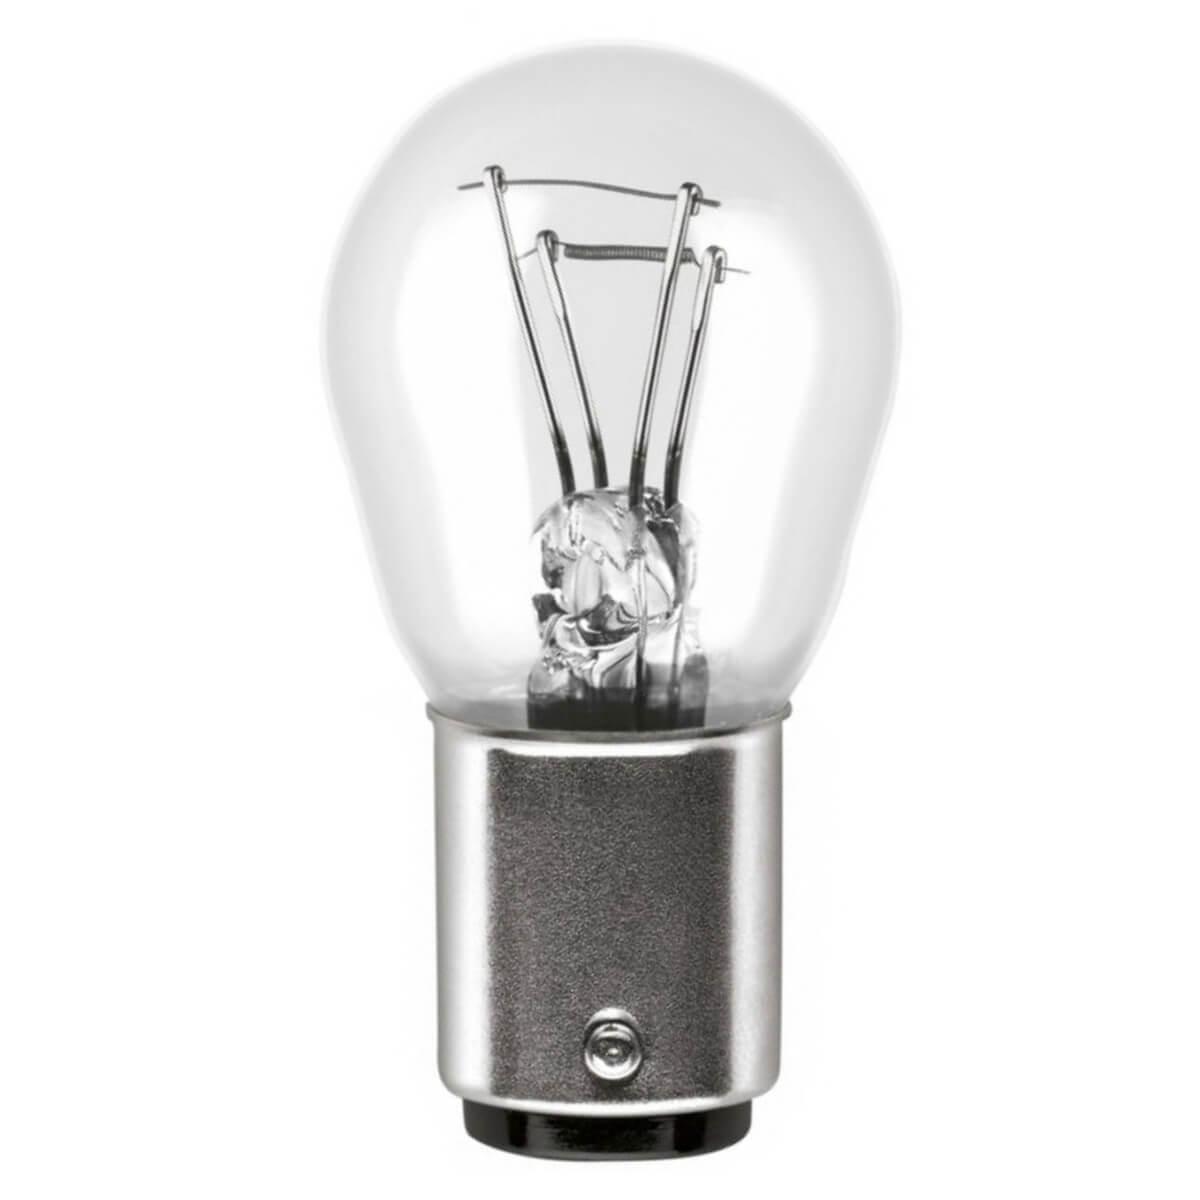 Tail / Stop Light Bulb